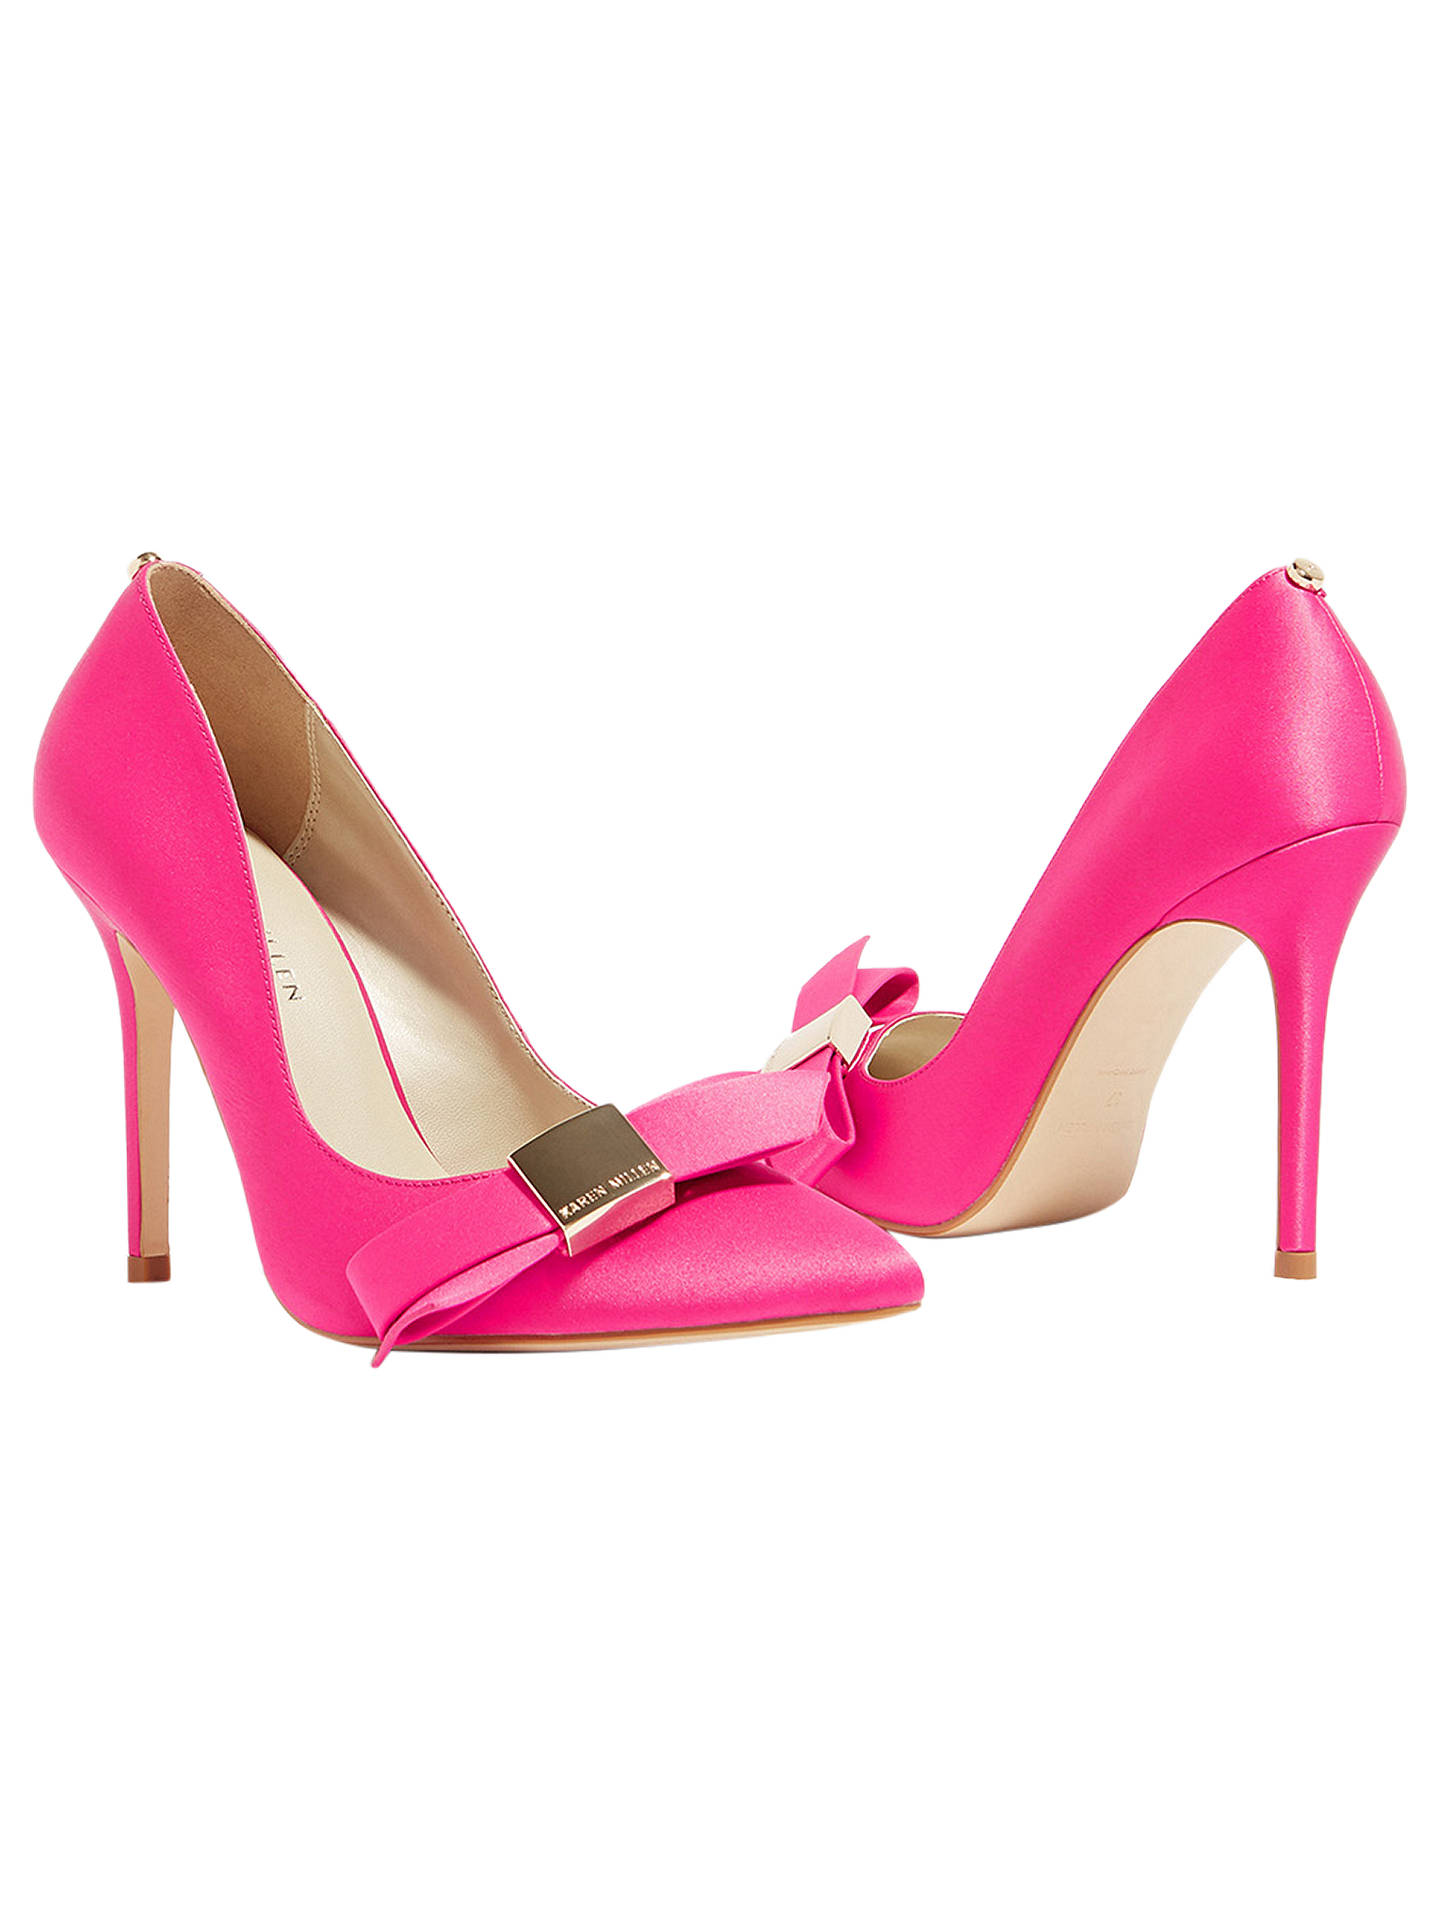 b894f0bd00c Karen Millen Stiletto Heel Bow Court Shoes, Pink at John Lewis ...